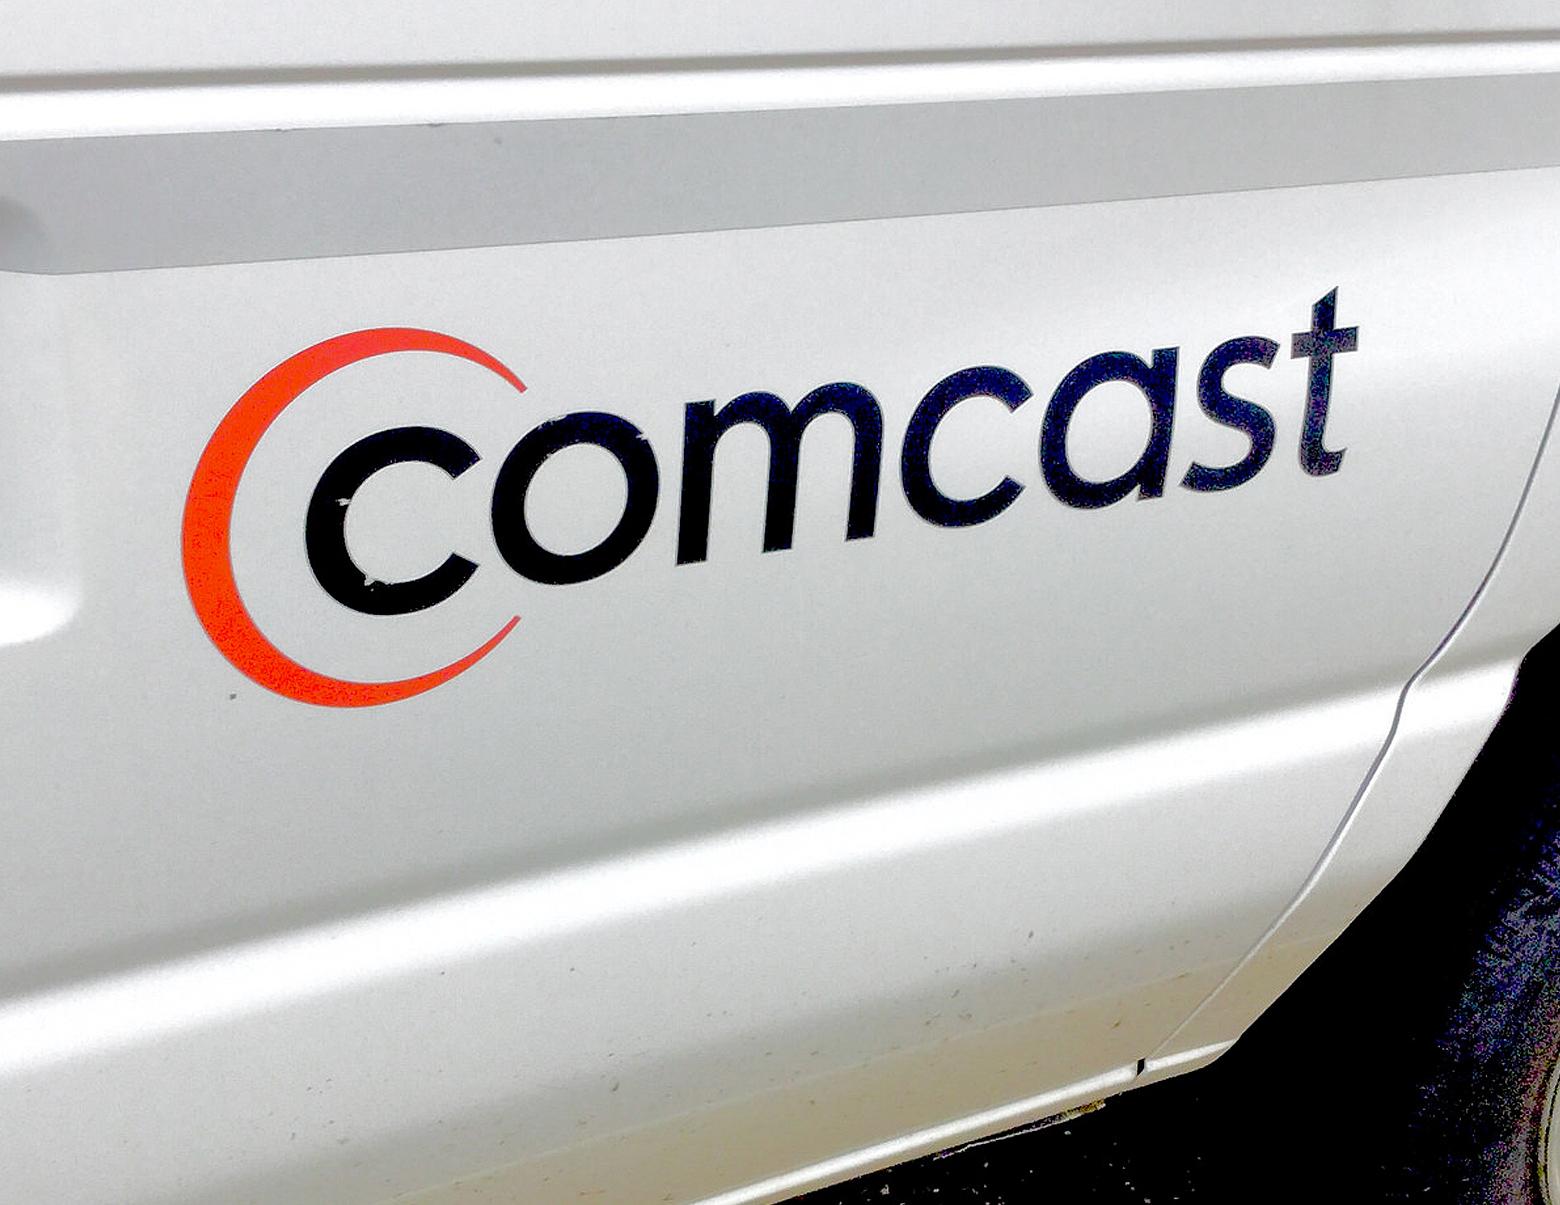 Comcast wireless plan